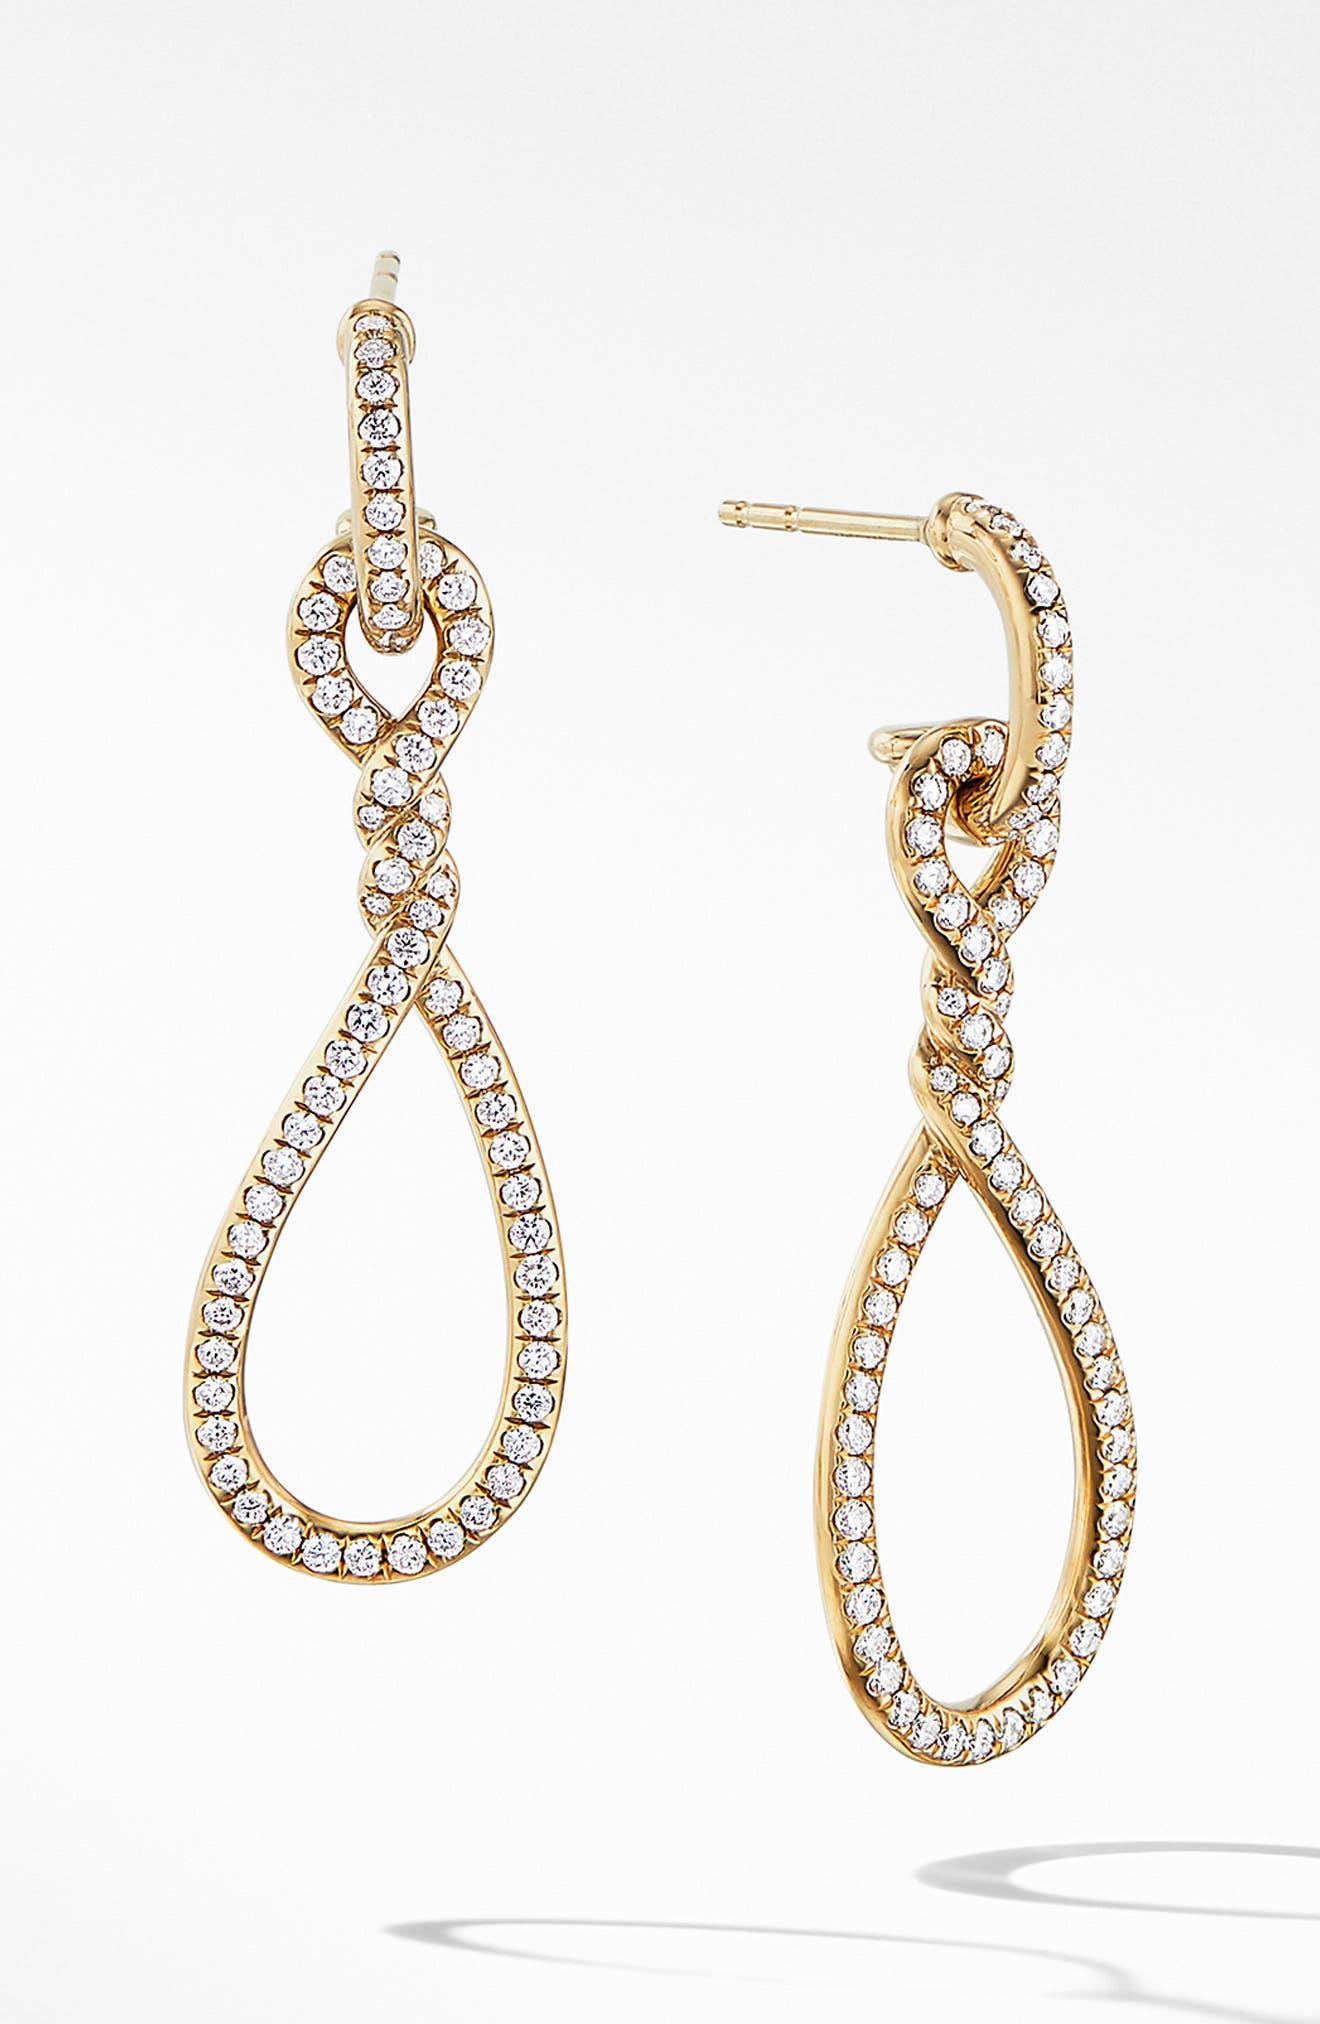 DAVID YURMAN,                             Continuance Full Pavé Small Drop Earrings in 18K Yellow Gold,                             Main thumbnail 1, color,                             YELLOW GOLD/ DIAMOND